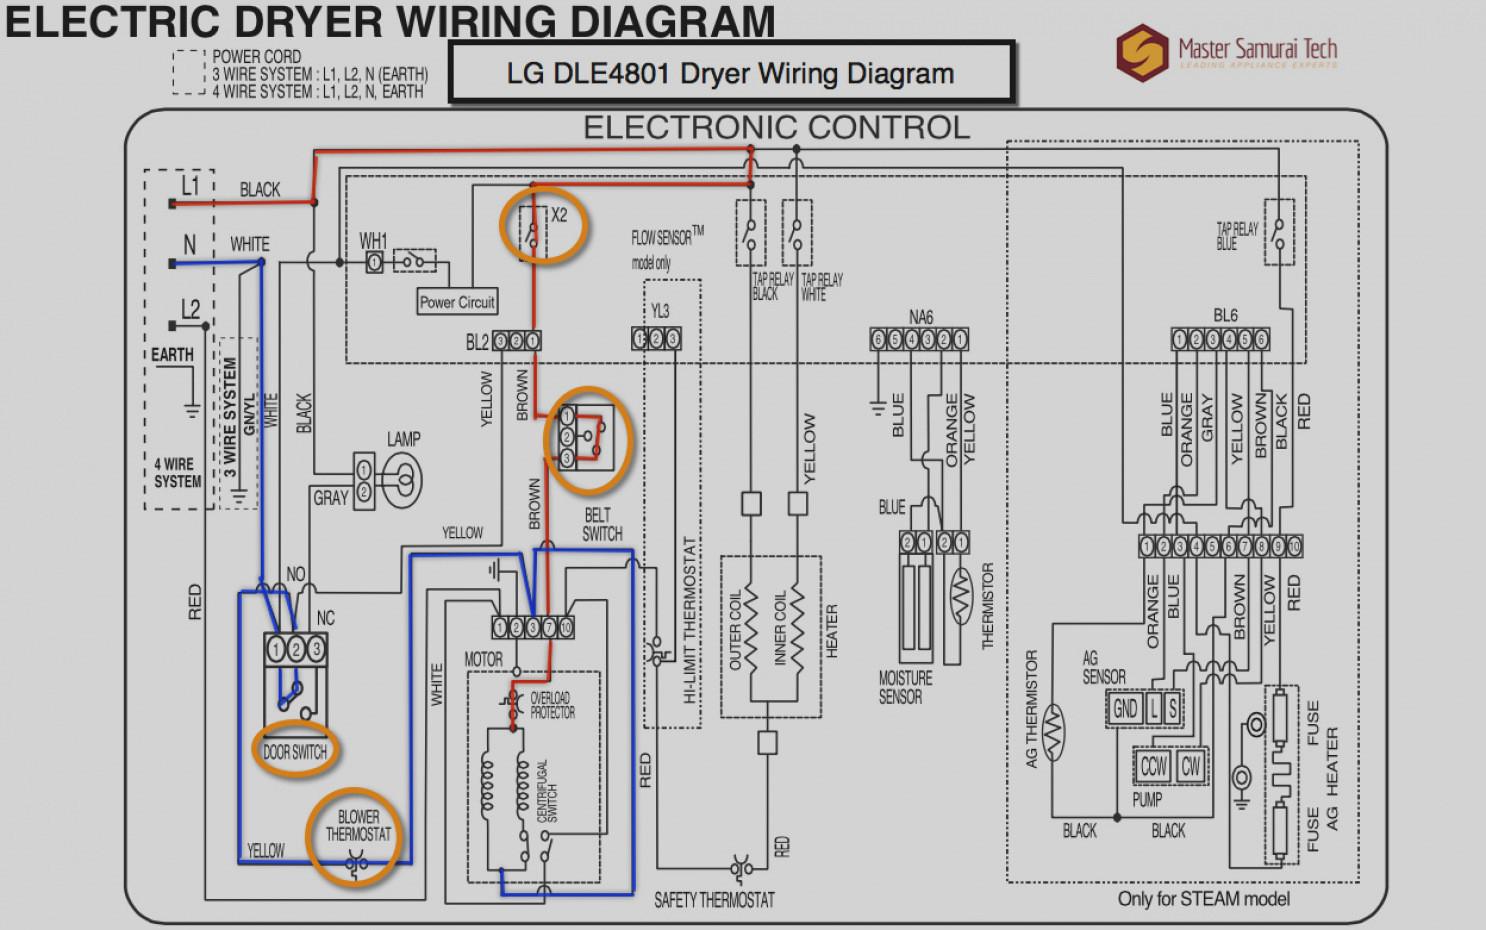 Roper Washer Wiring Diagram - Fusebox and Wiring Diagram schematic-net -  schematic-net.sirtarghe.itdiagram database